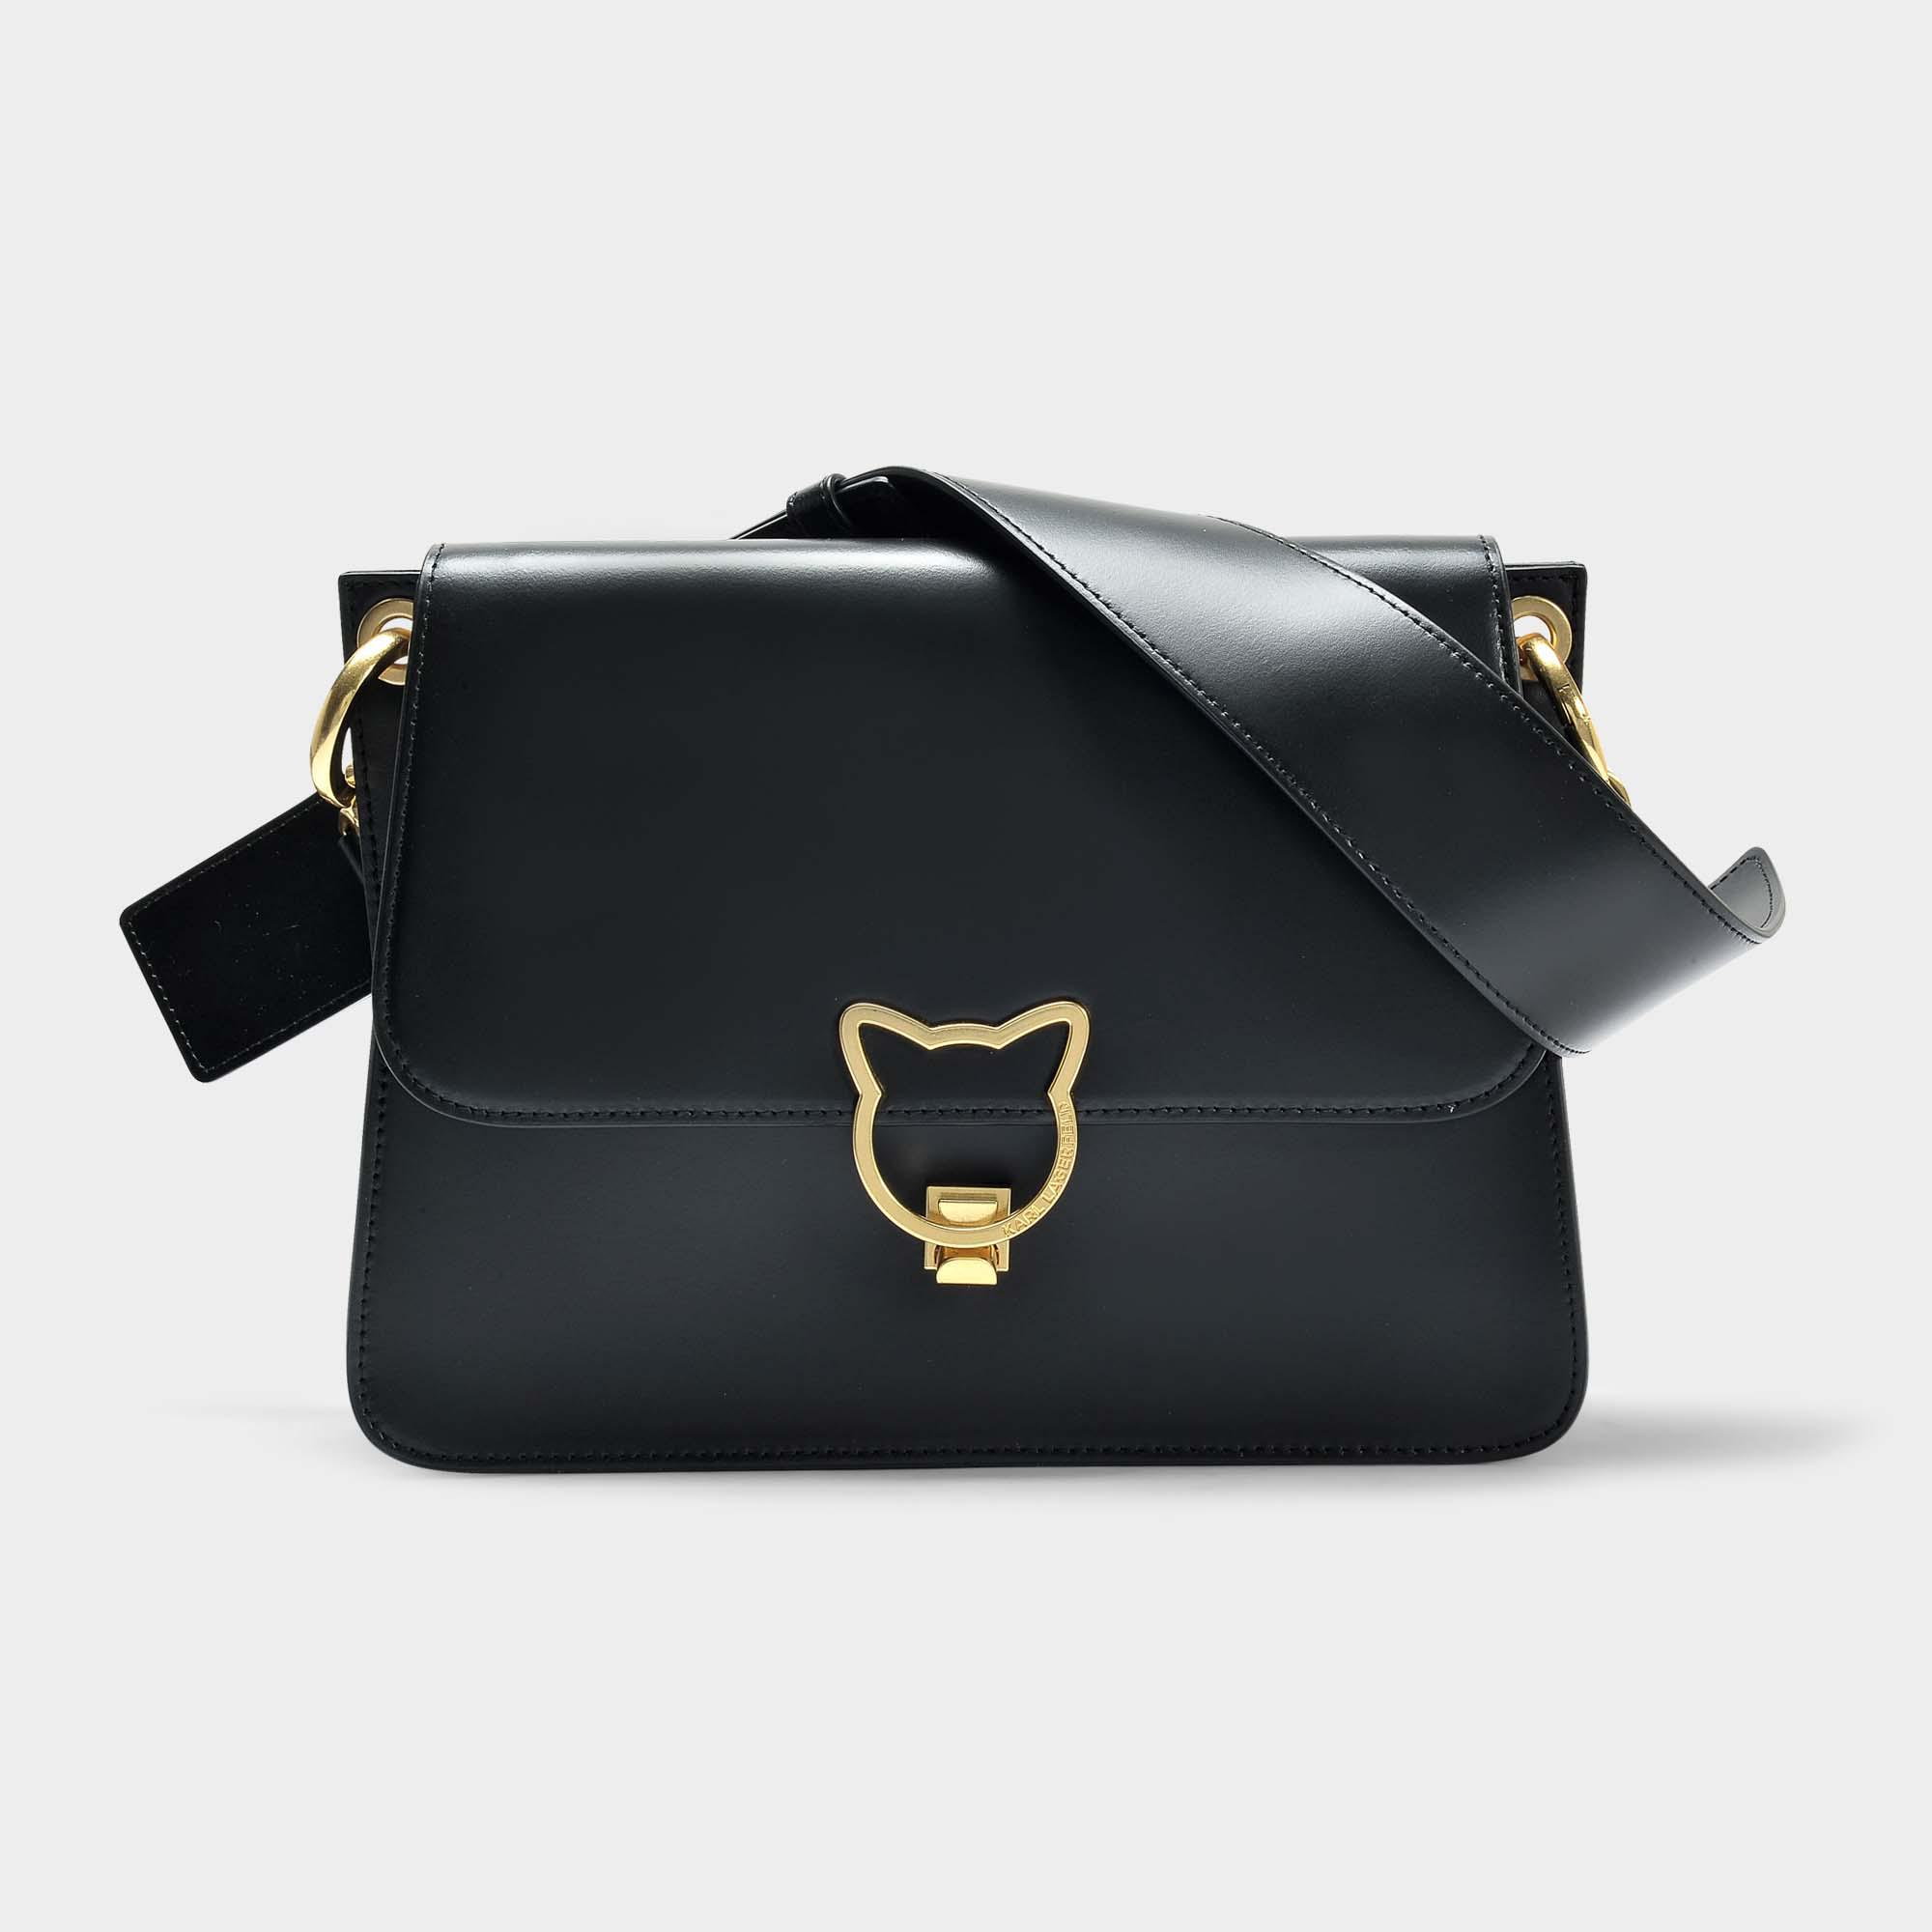 Kat Lock shoulder bag - Black Karl Lagerfeld g6jahzx